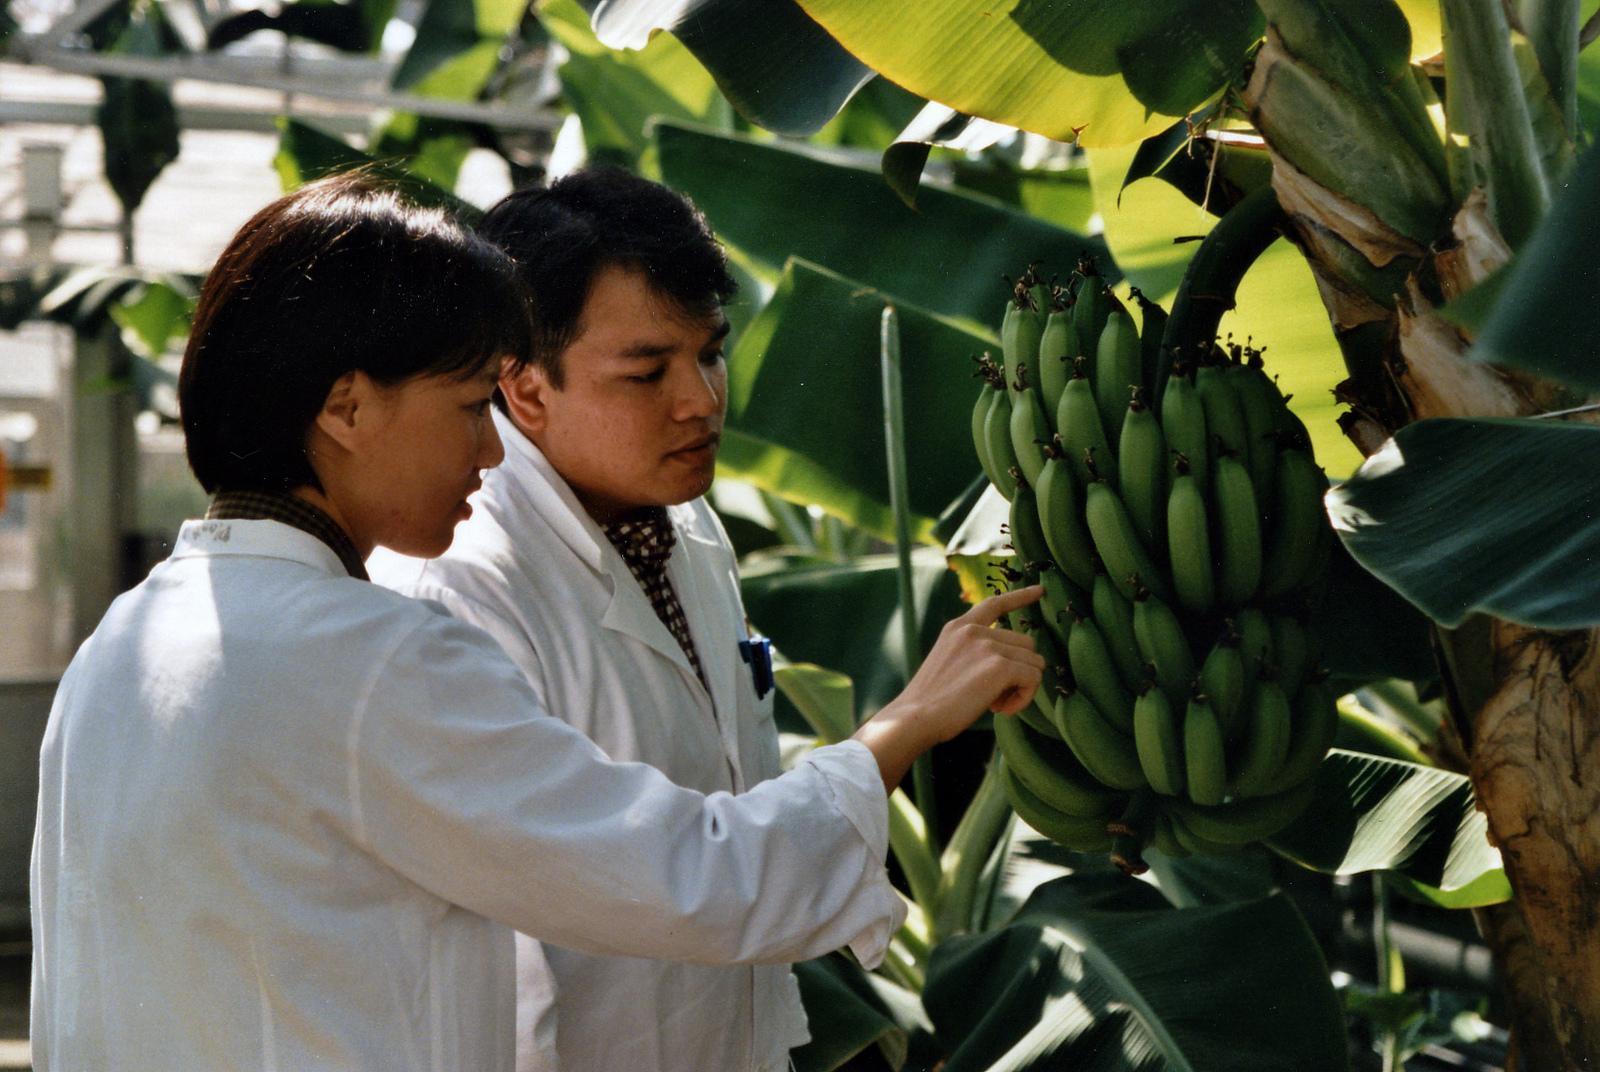 Researchers analyze a cask of bananas at IAEA Plant Breeding Unit in Seibersdorf, Austria. Image by  IAEA Imagebank via Flickr